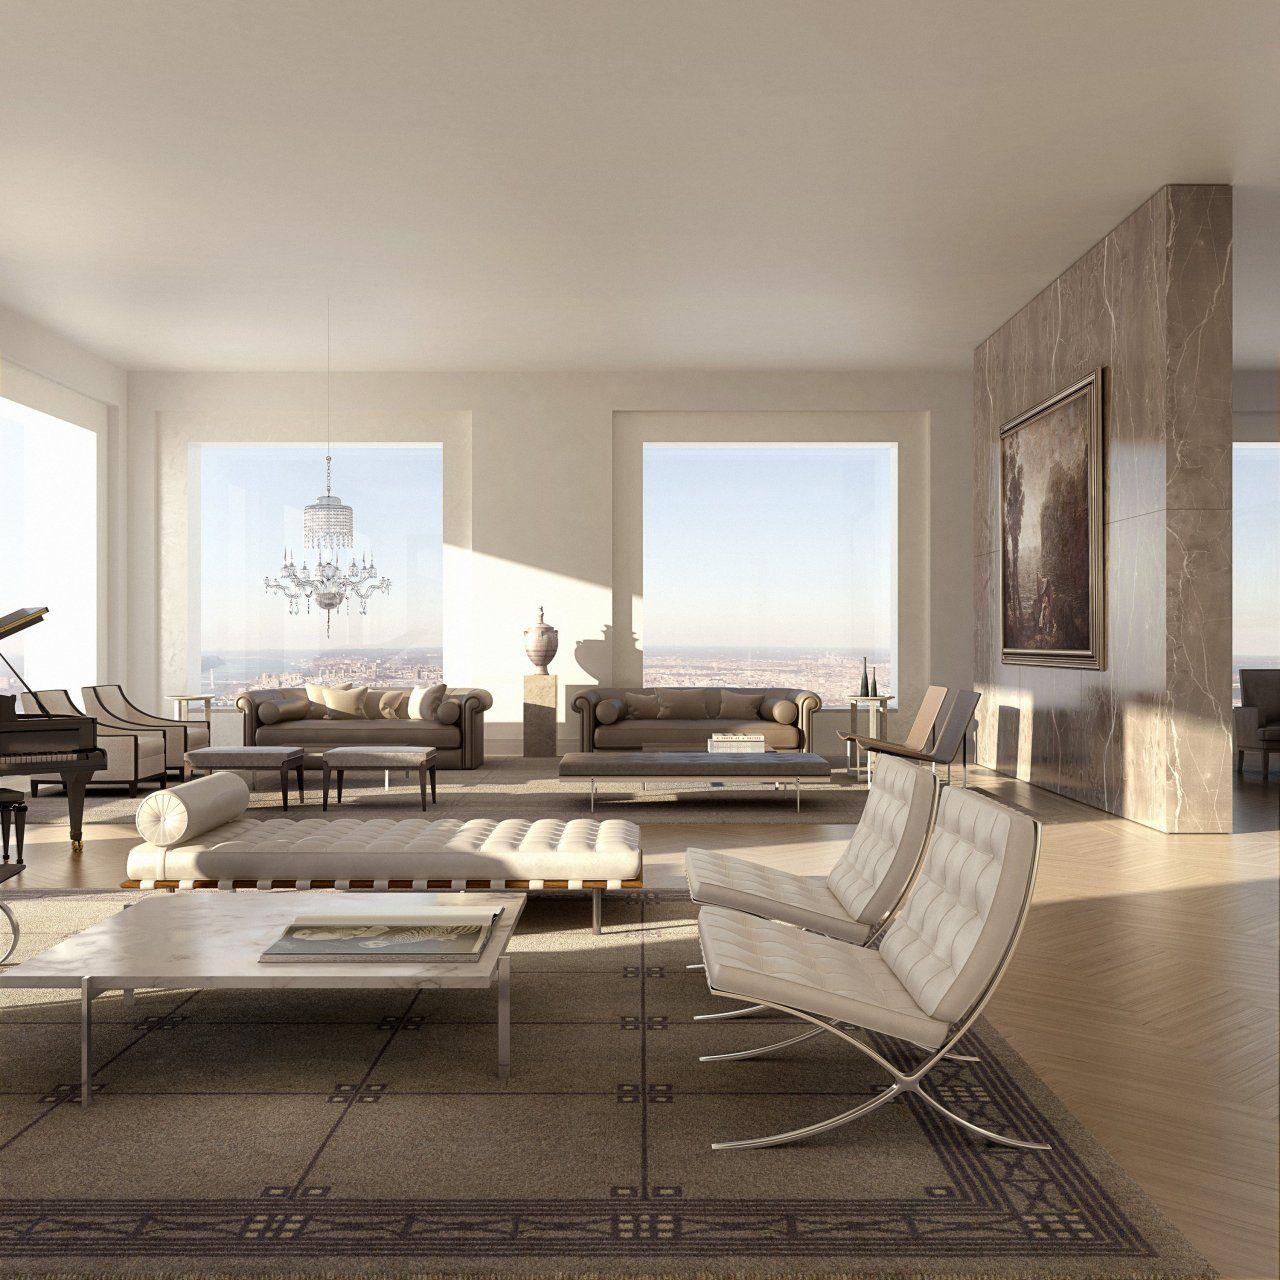 The Avenue By Executive Apartments: New York Penthouse, Park Avenue Apartment